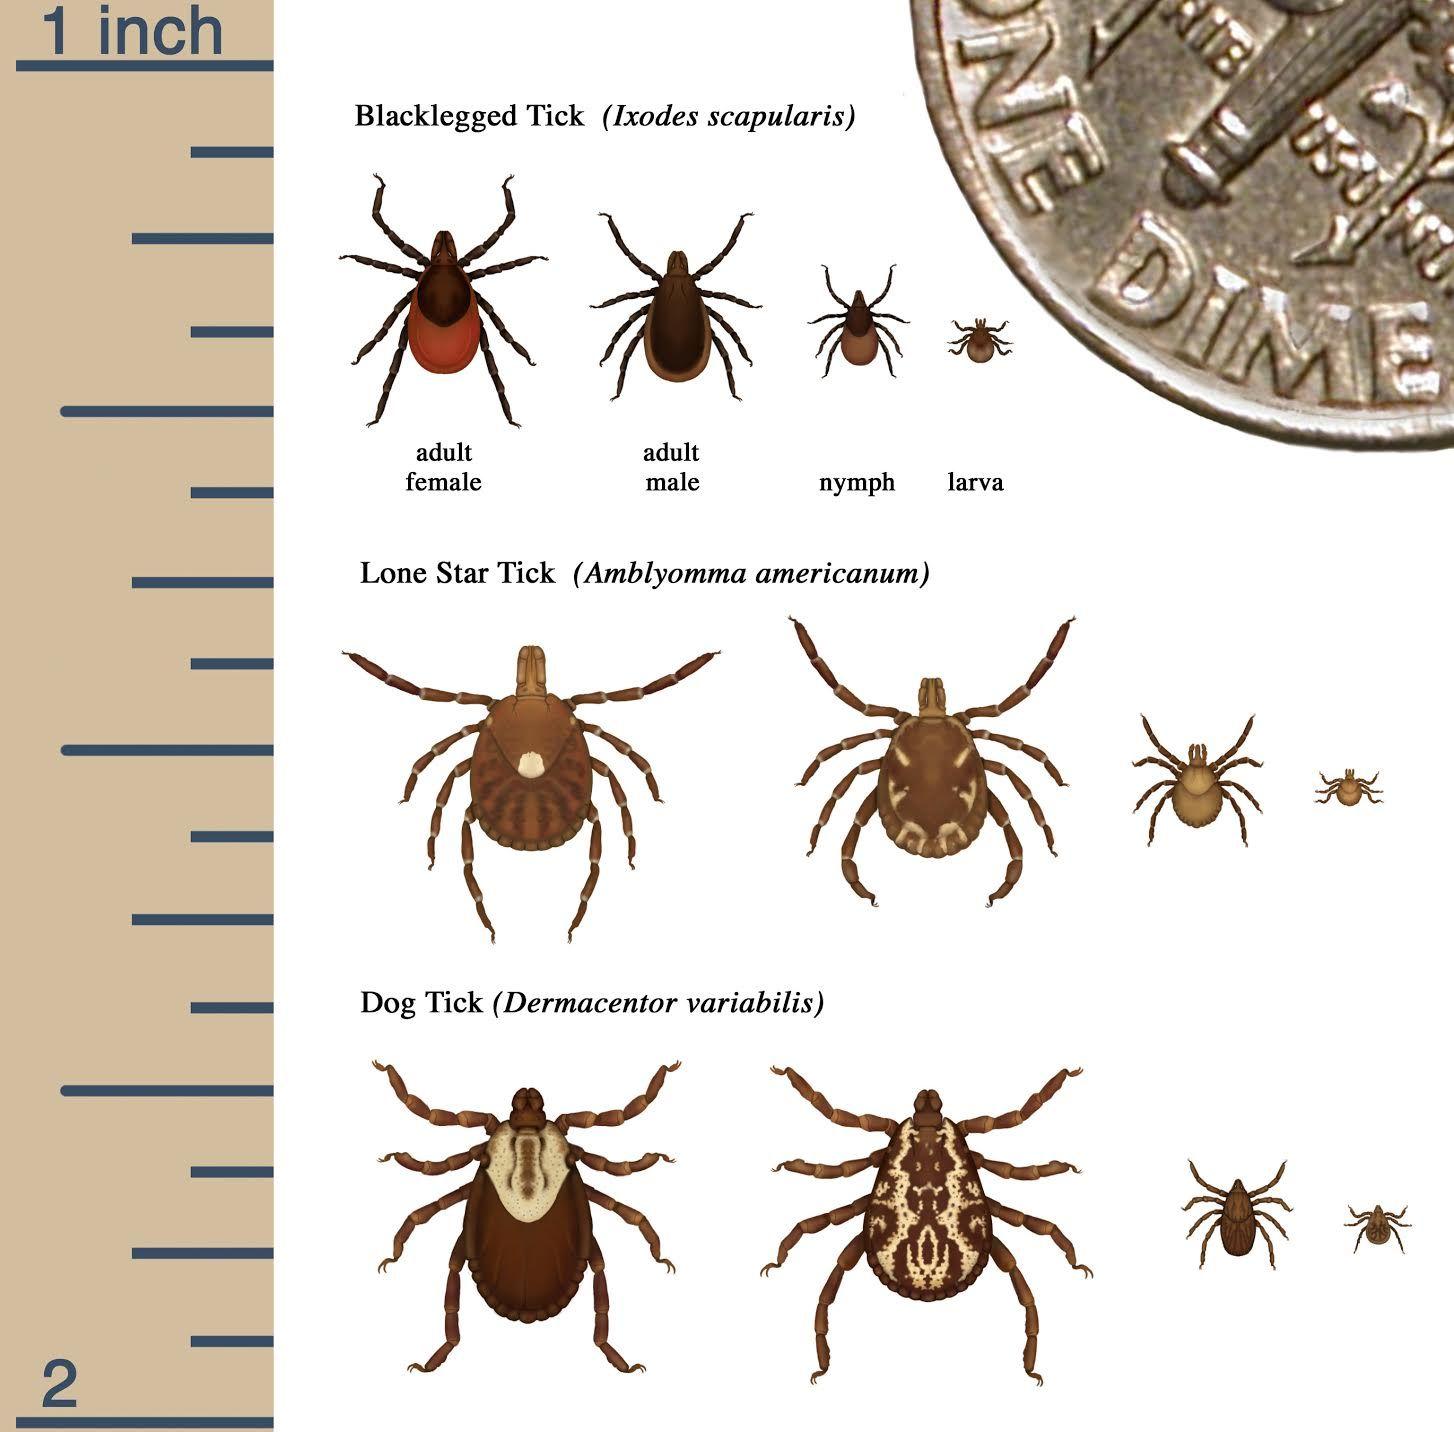 Ticks.jpg Chasse au cerf, D.o., Chien